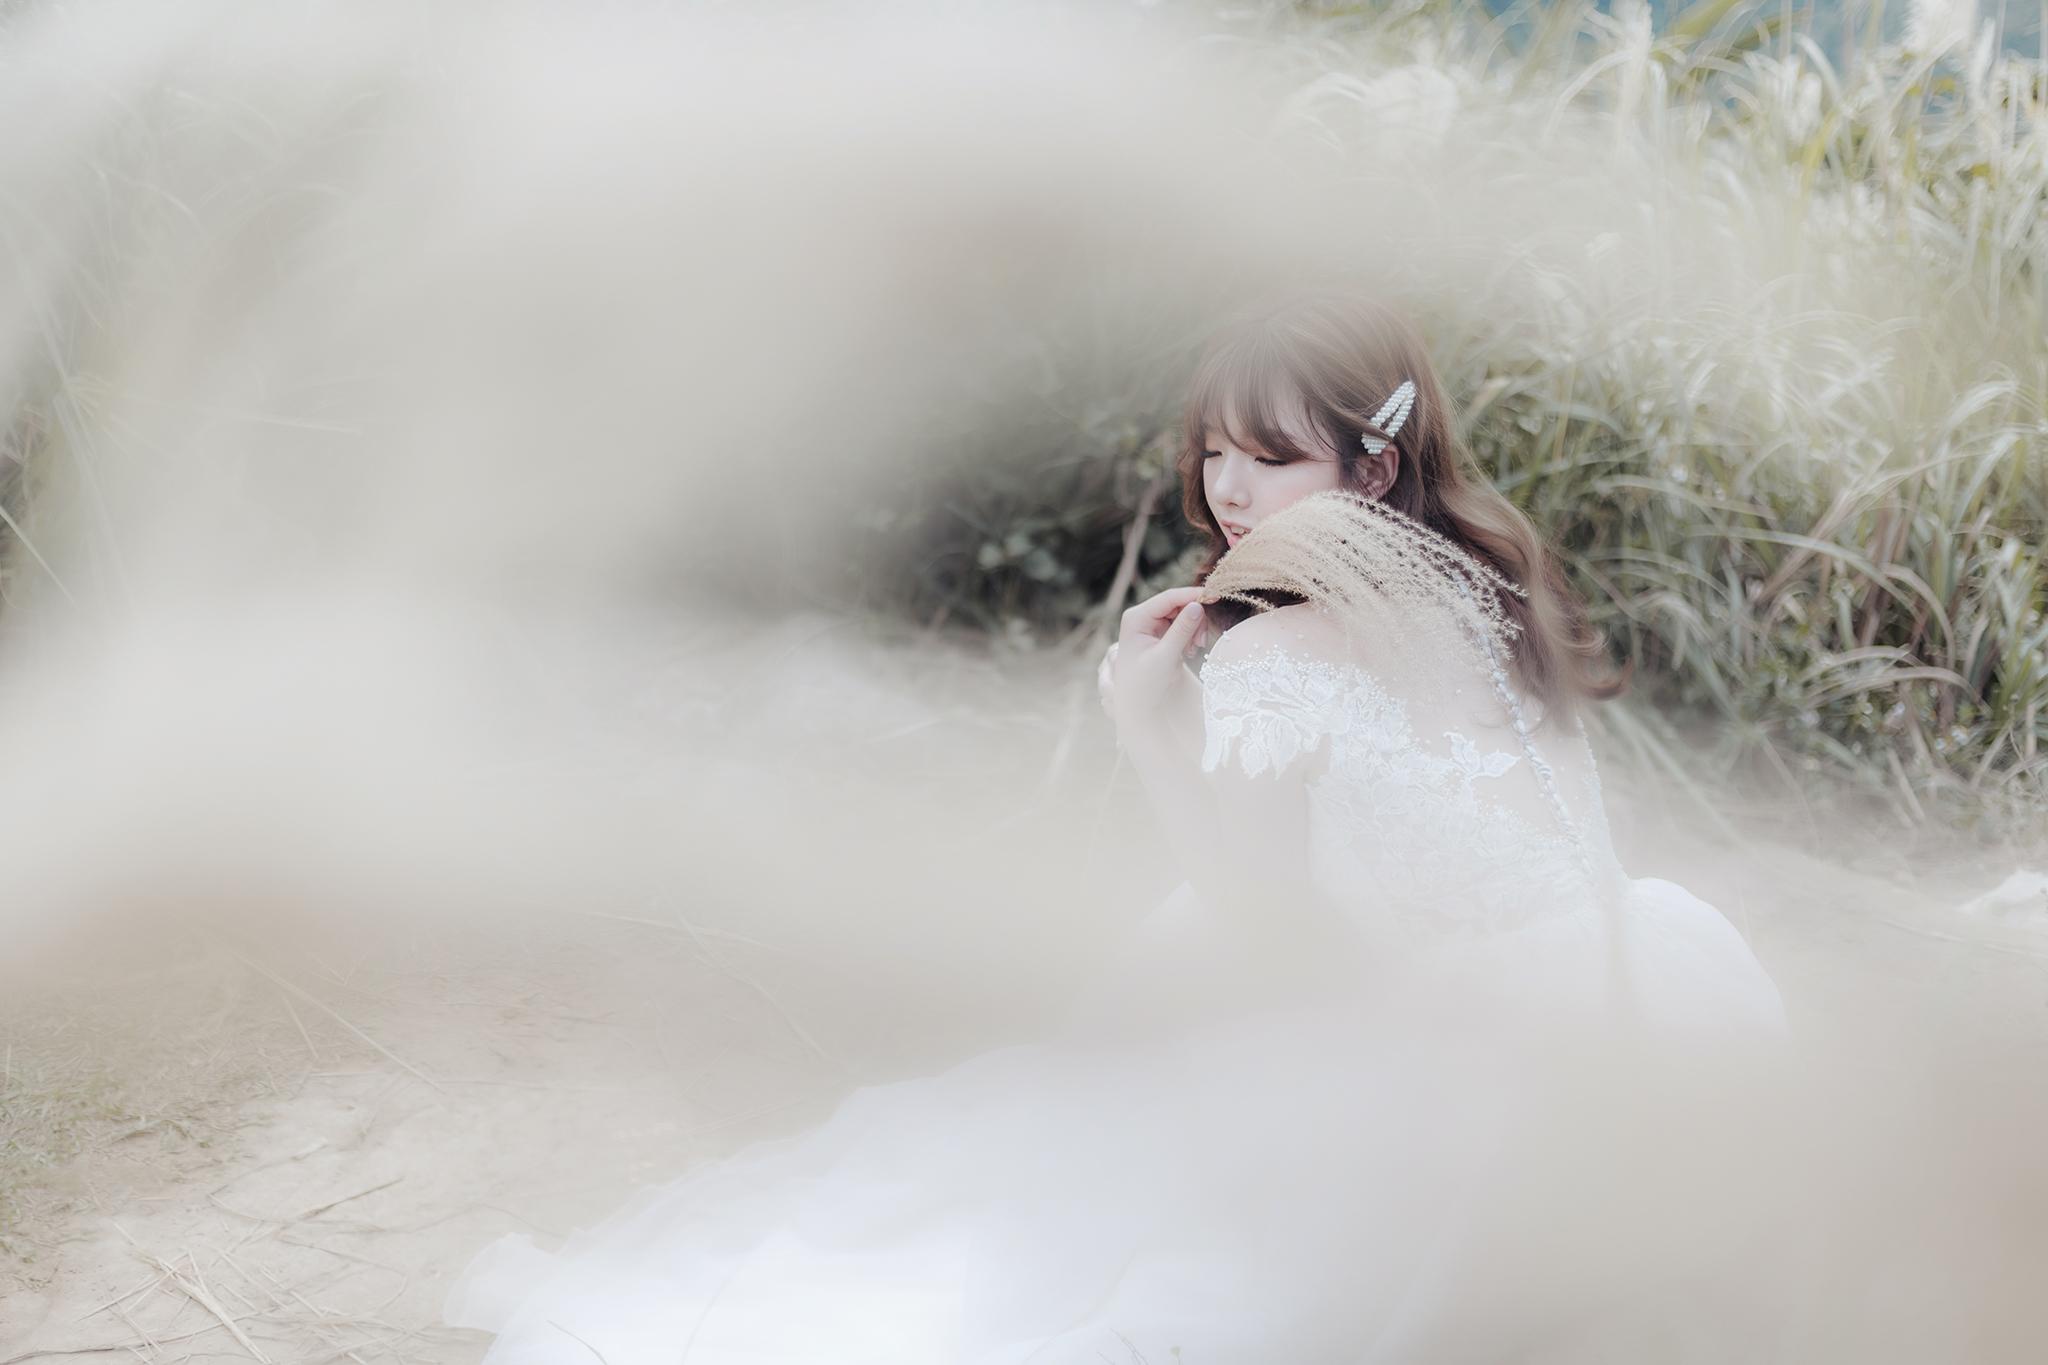 50697237716 09f07c44f6 o - 【自主婚紗】+凱婷+